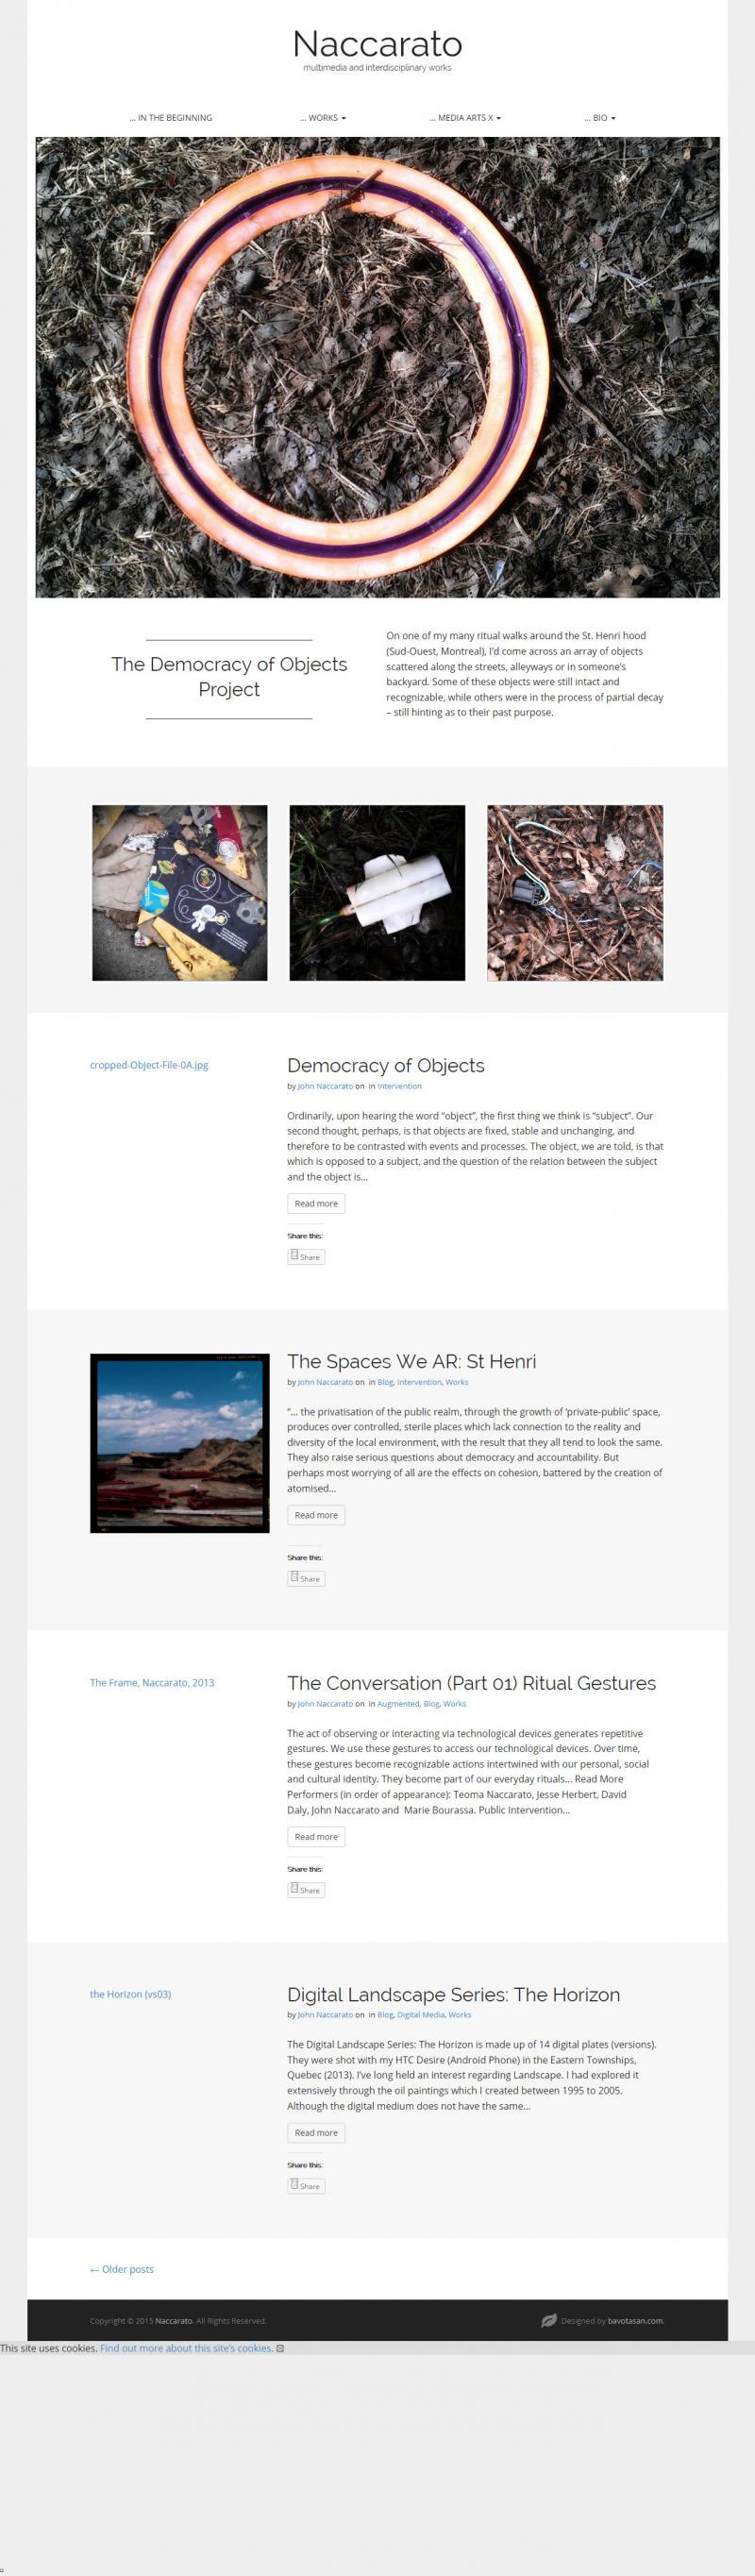 Naccarato.org Website, Wayback Machine, Internet Archive, July, 2015